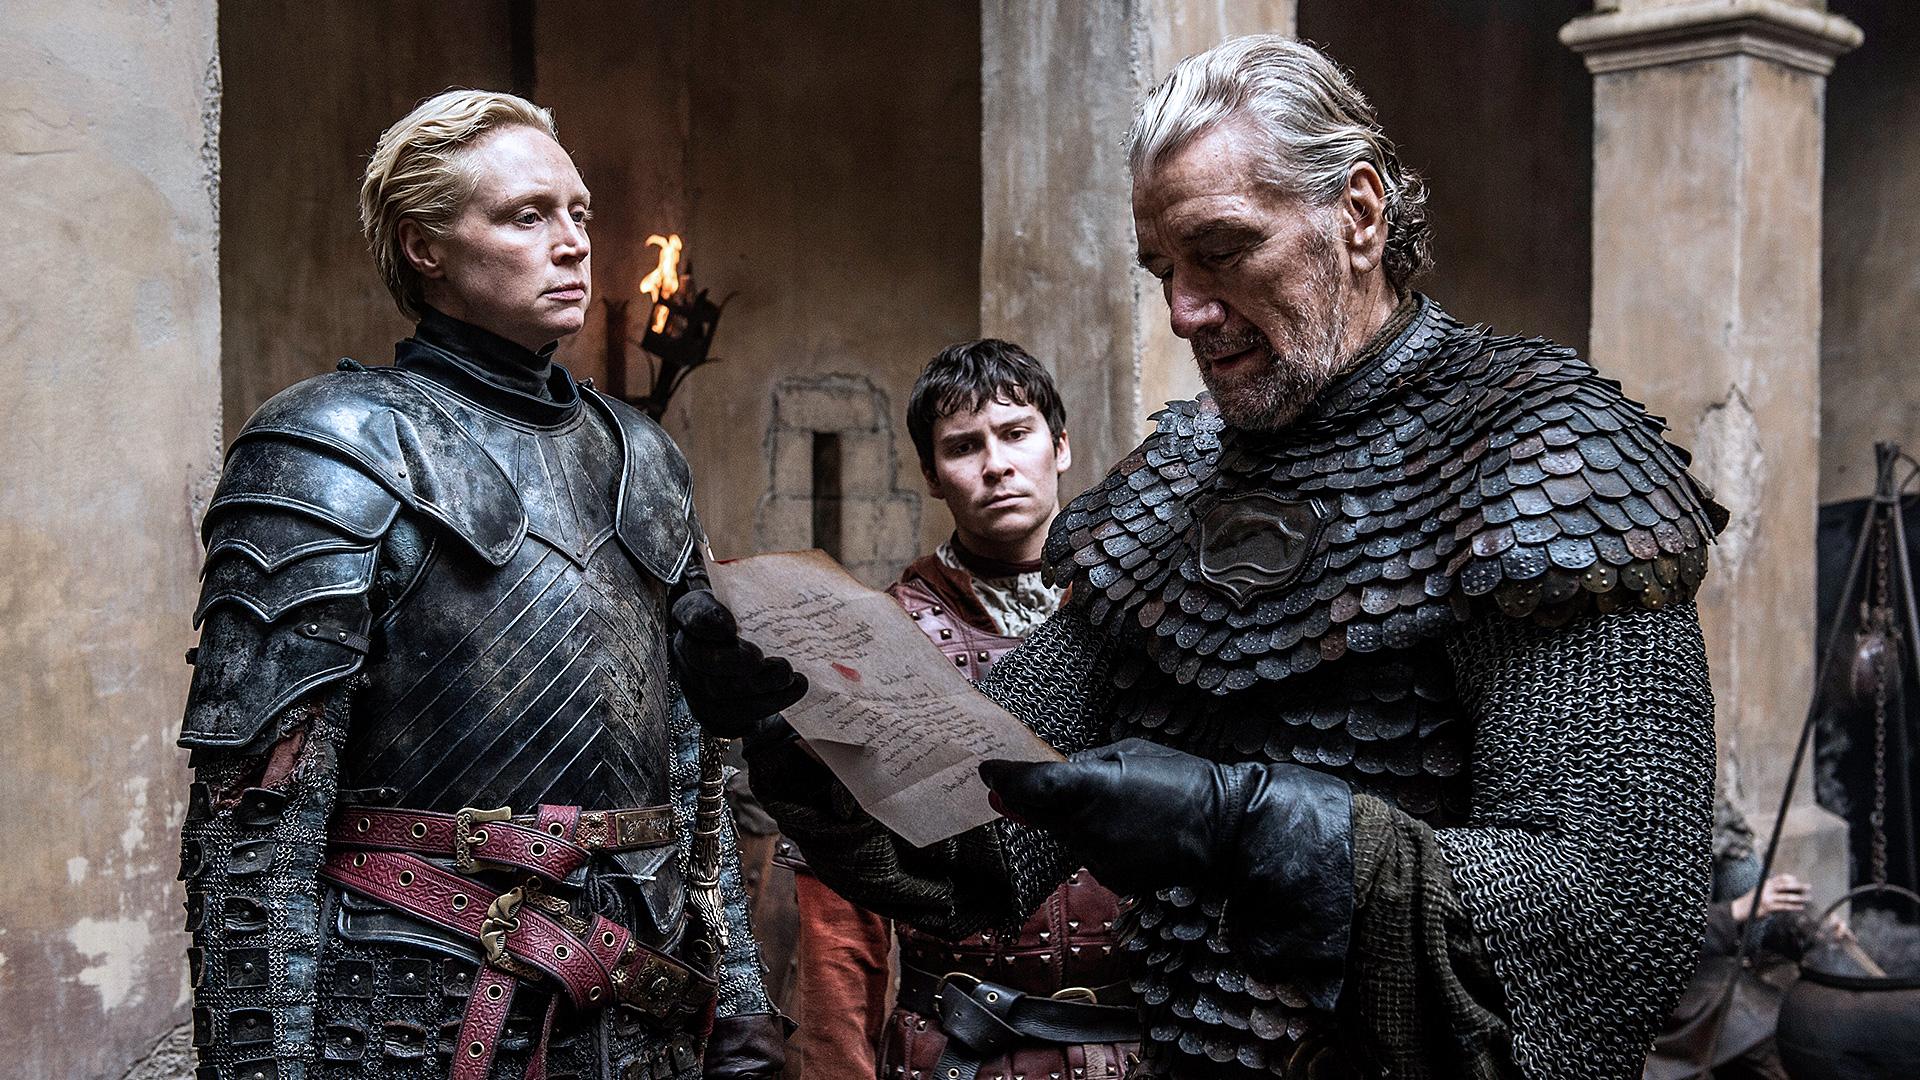 Image - HBO